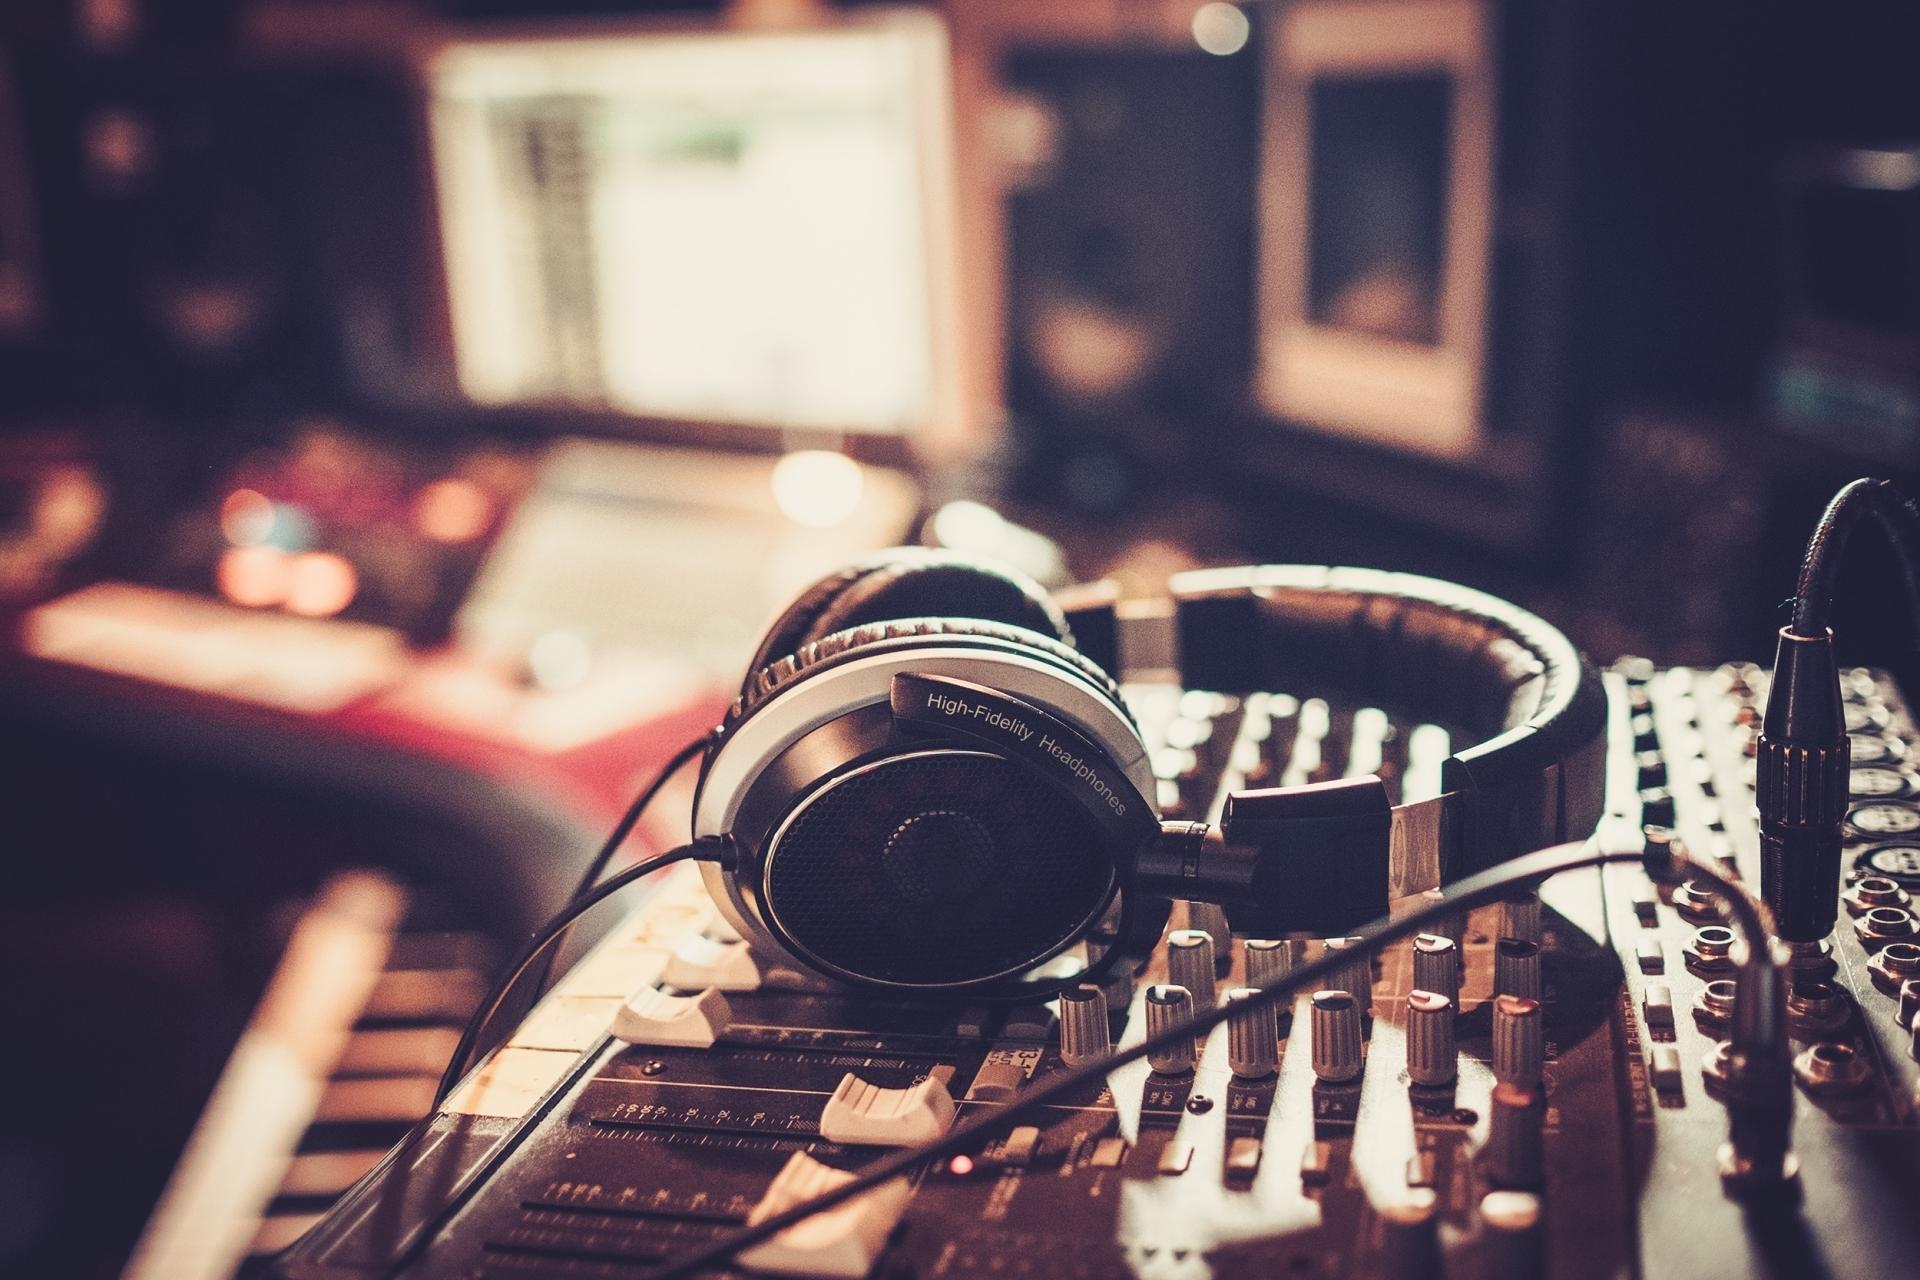 Soundboard with headphones on it